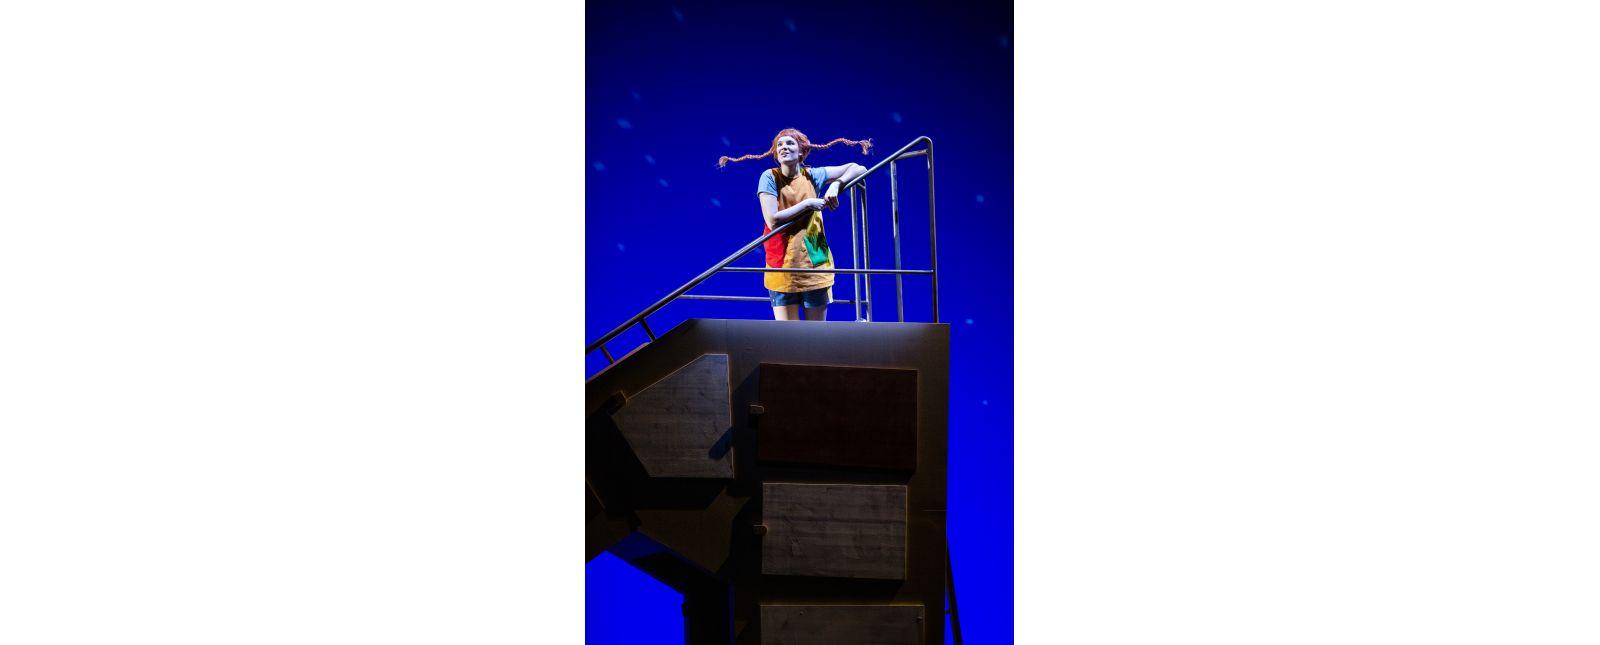 Pippi Langstrumpf // Charlotte Will // 2020 // Rainer Muranyi